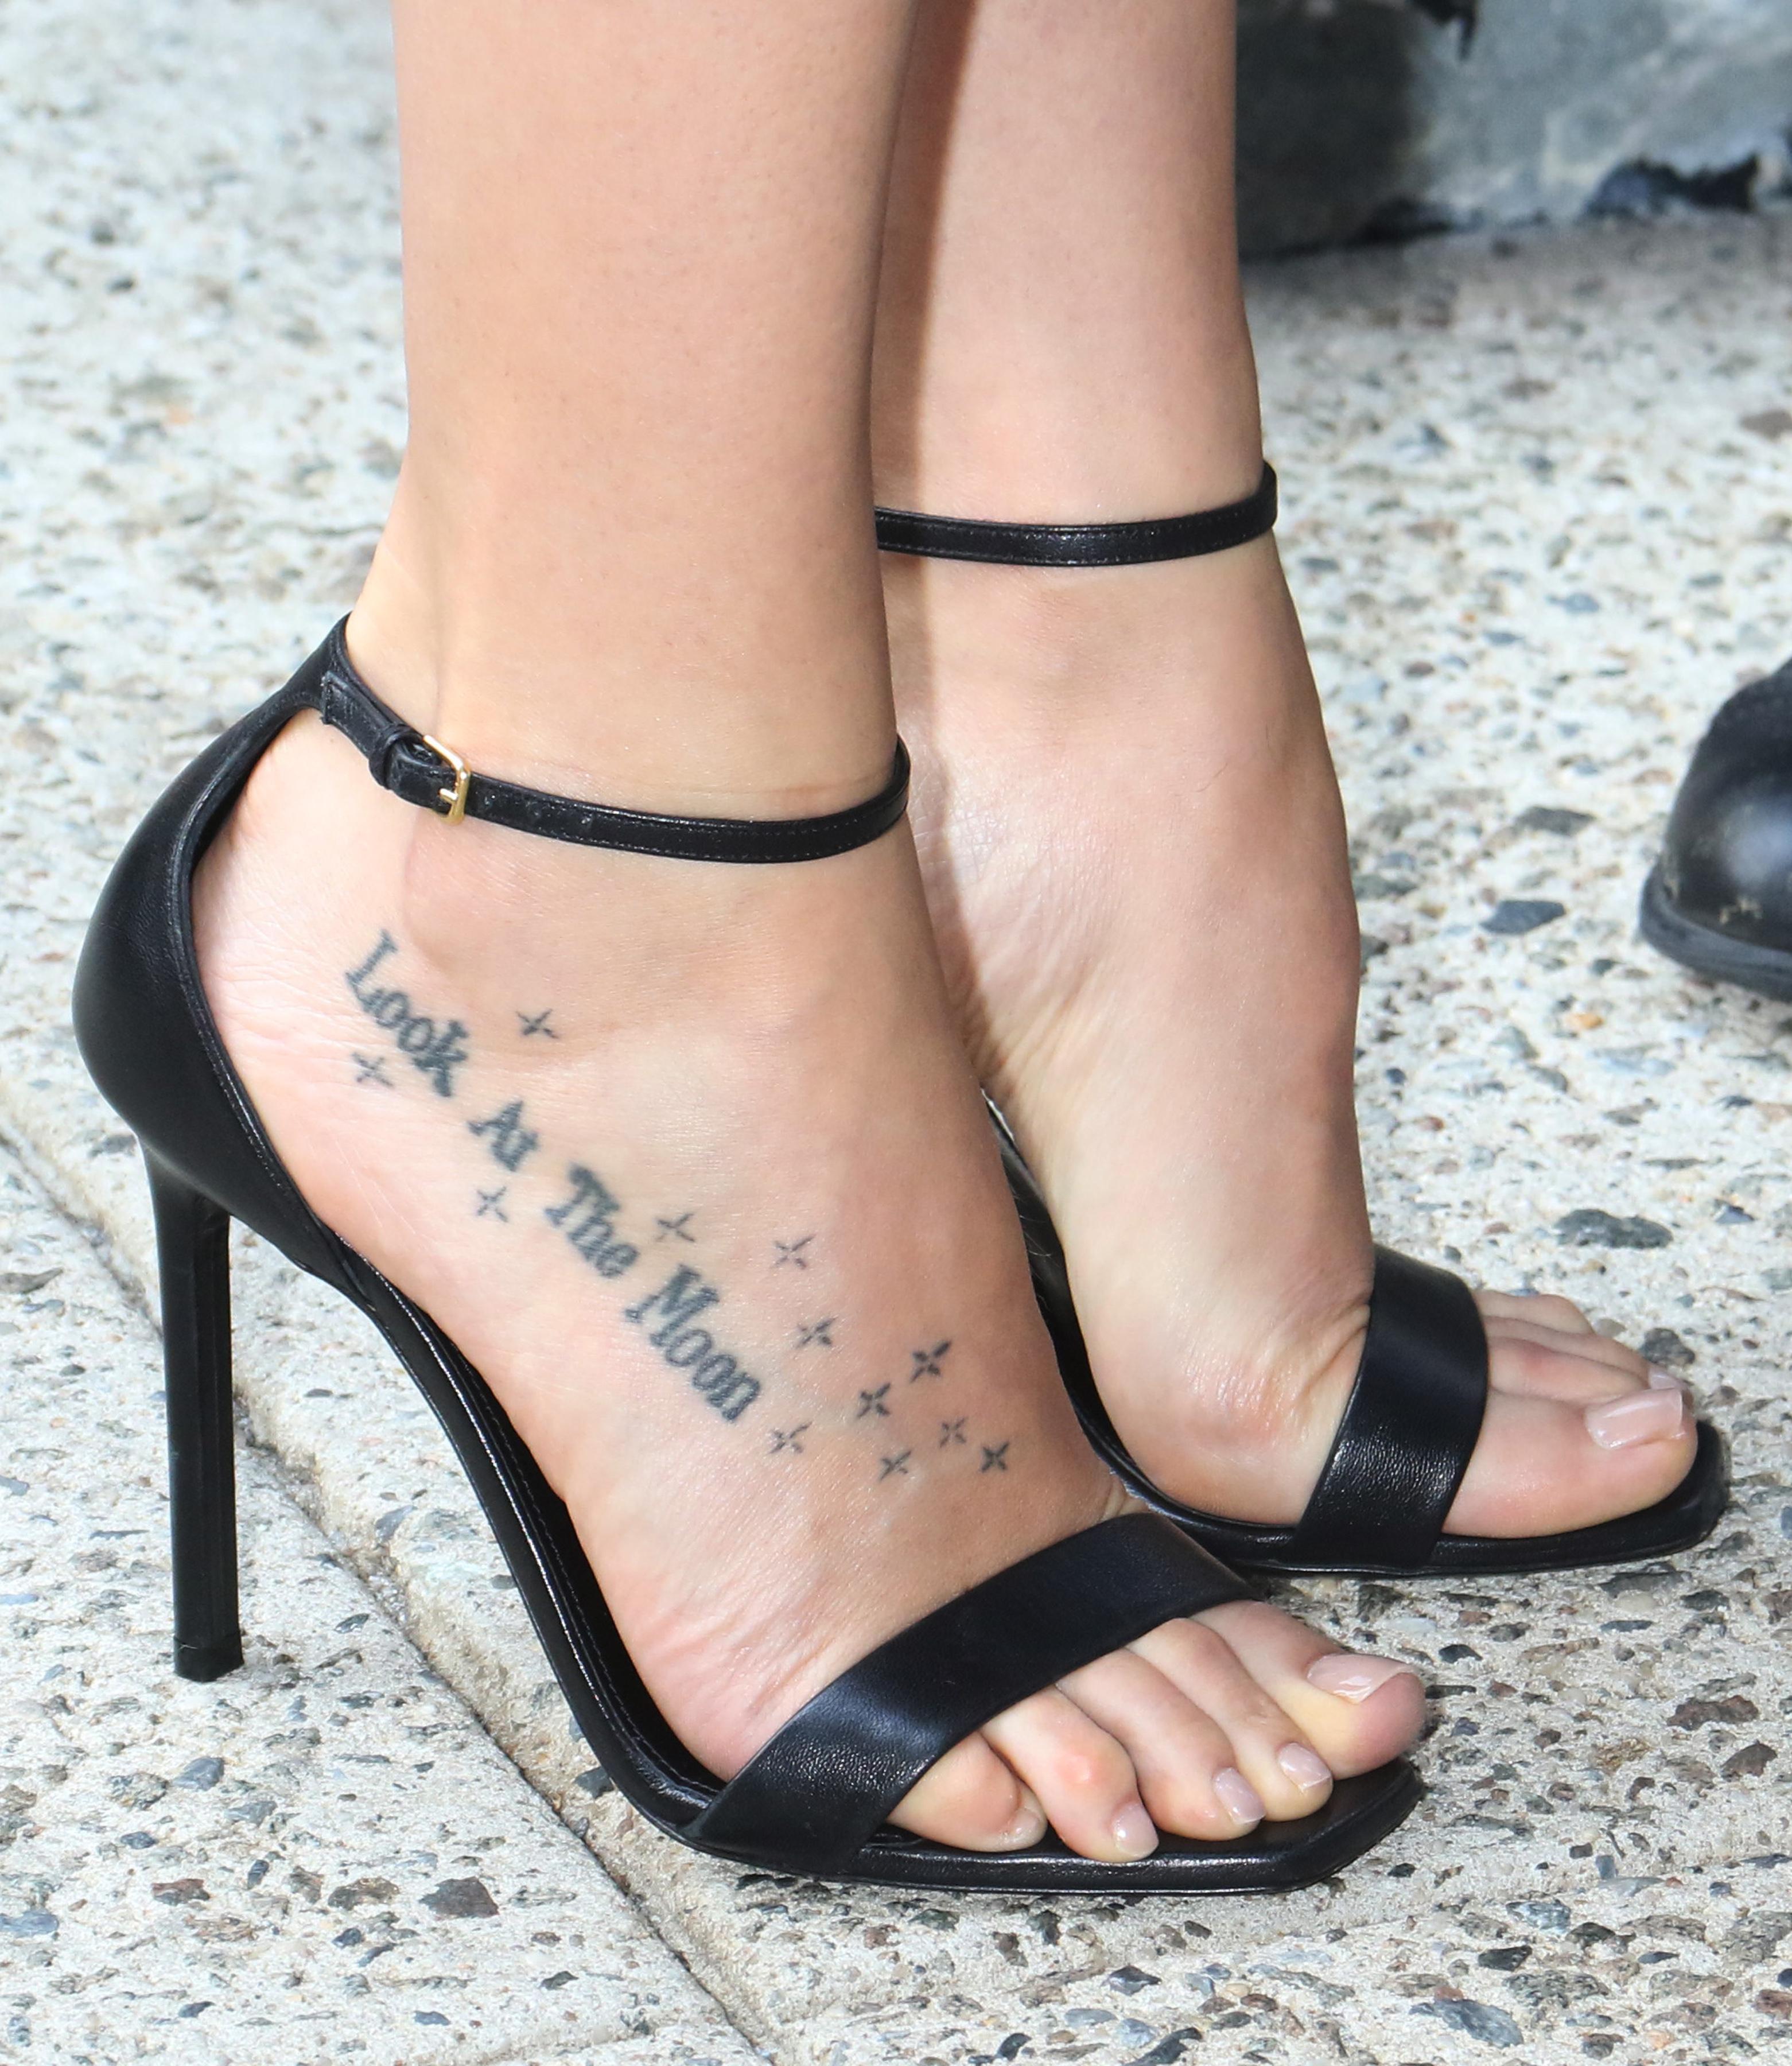 Dakota Johnsons Feet